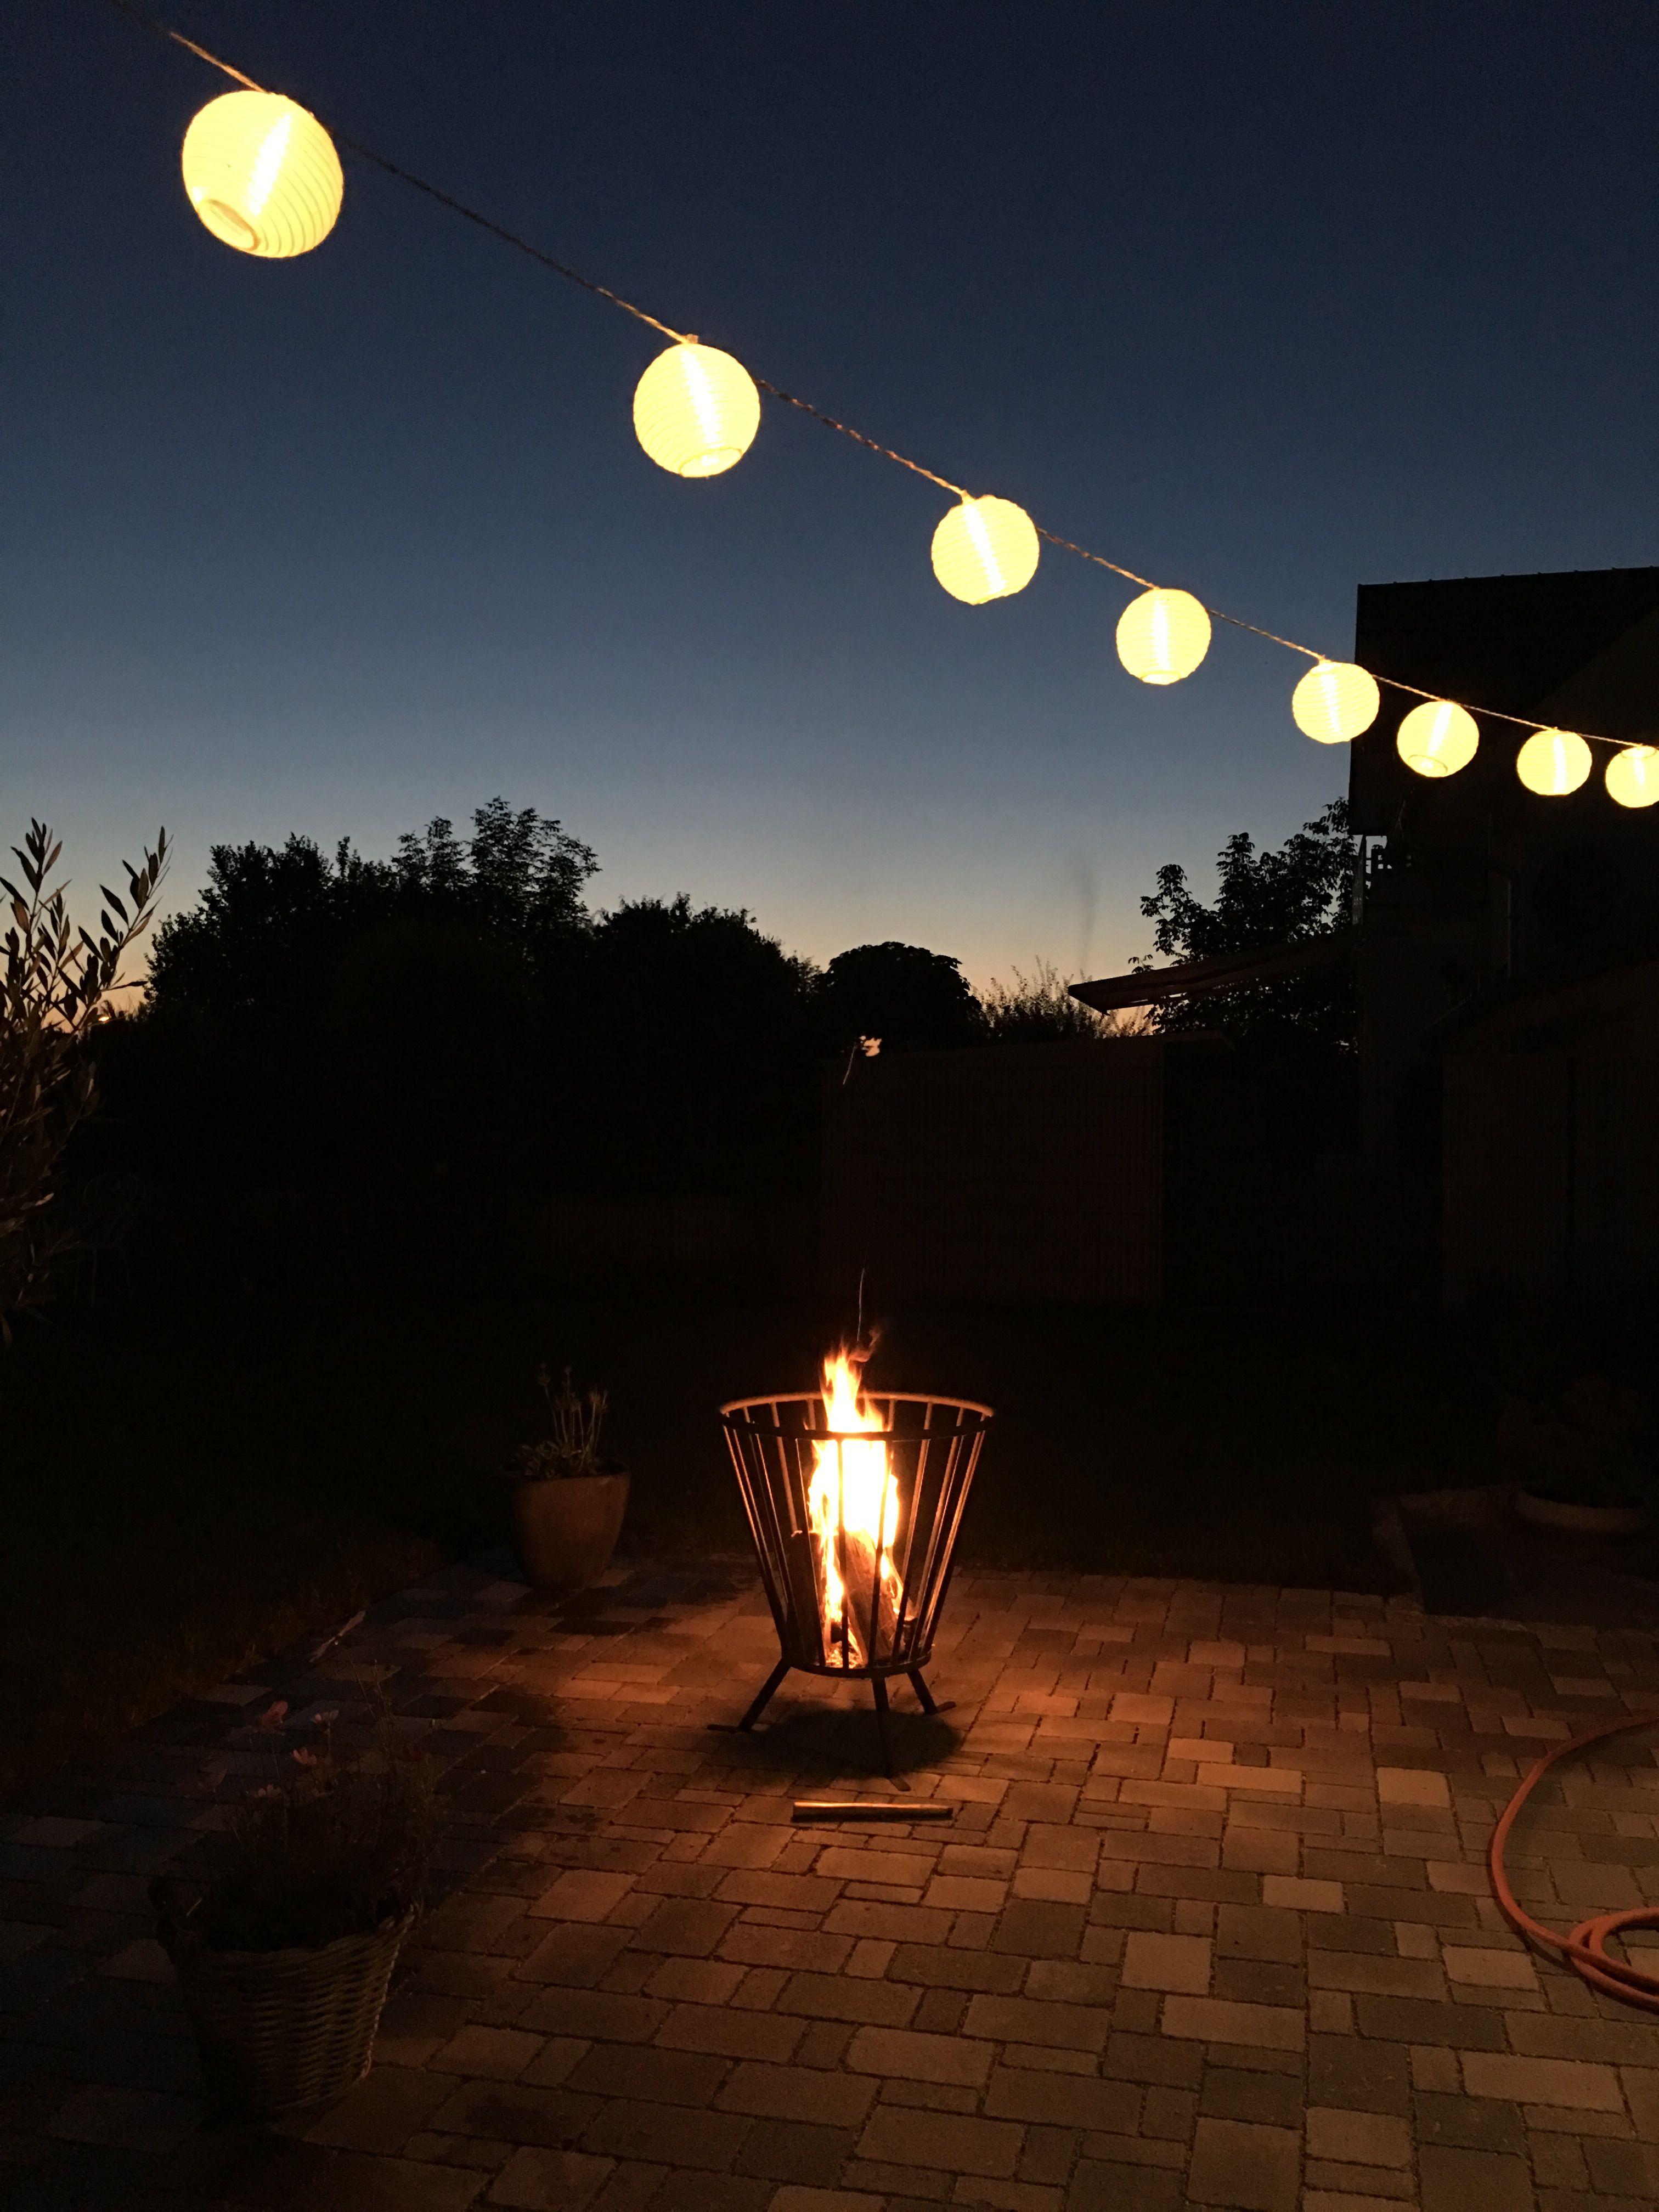 feuerkorb# lampions# spätsommer | gartenträume | pinterest, Hause und Garten